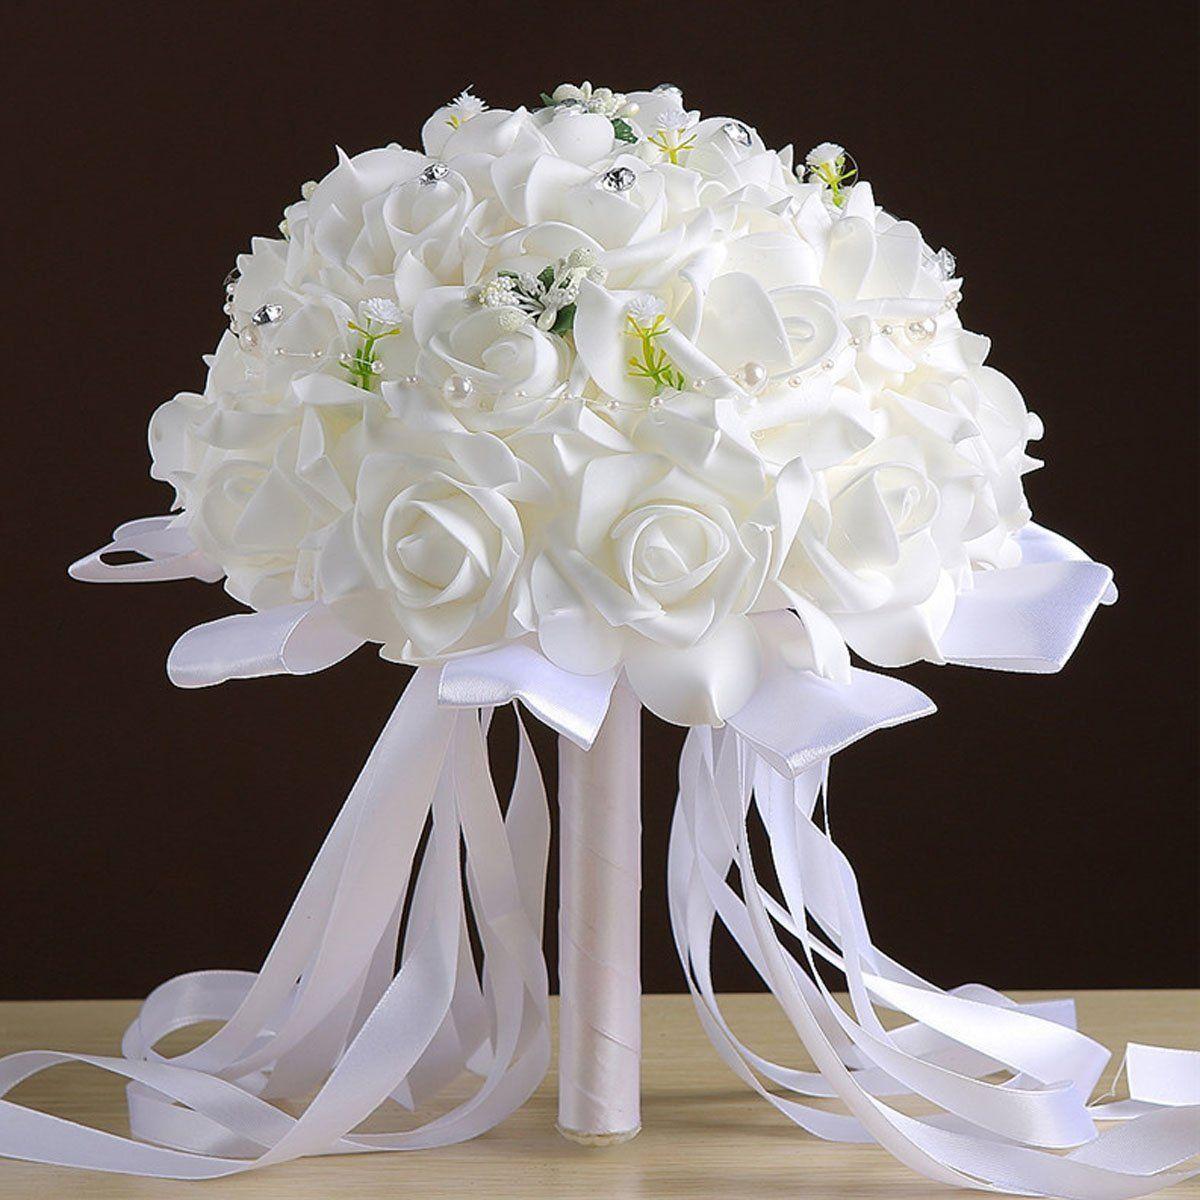 Amazon.com: Zebratown 9.5inch White Crystal Pearl Roses Bridal ...